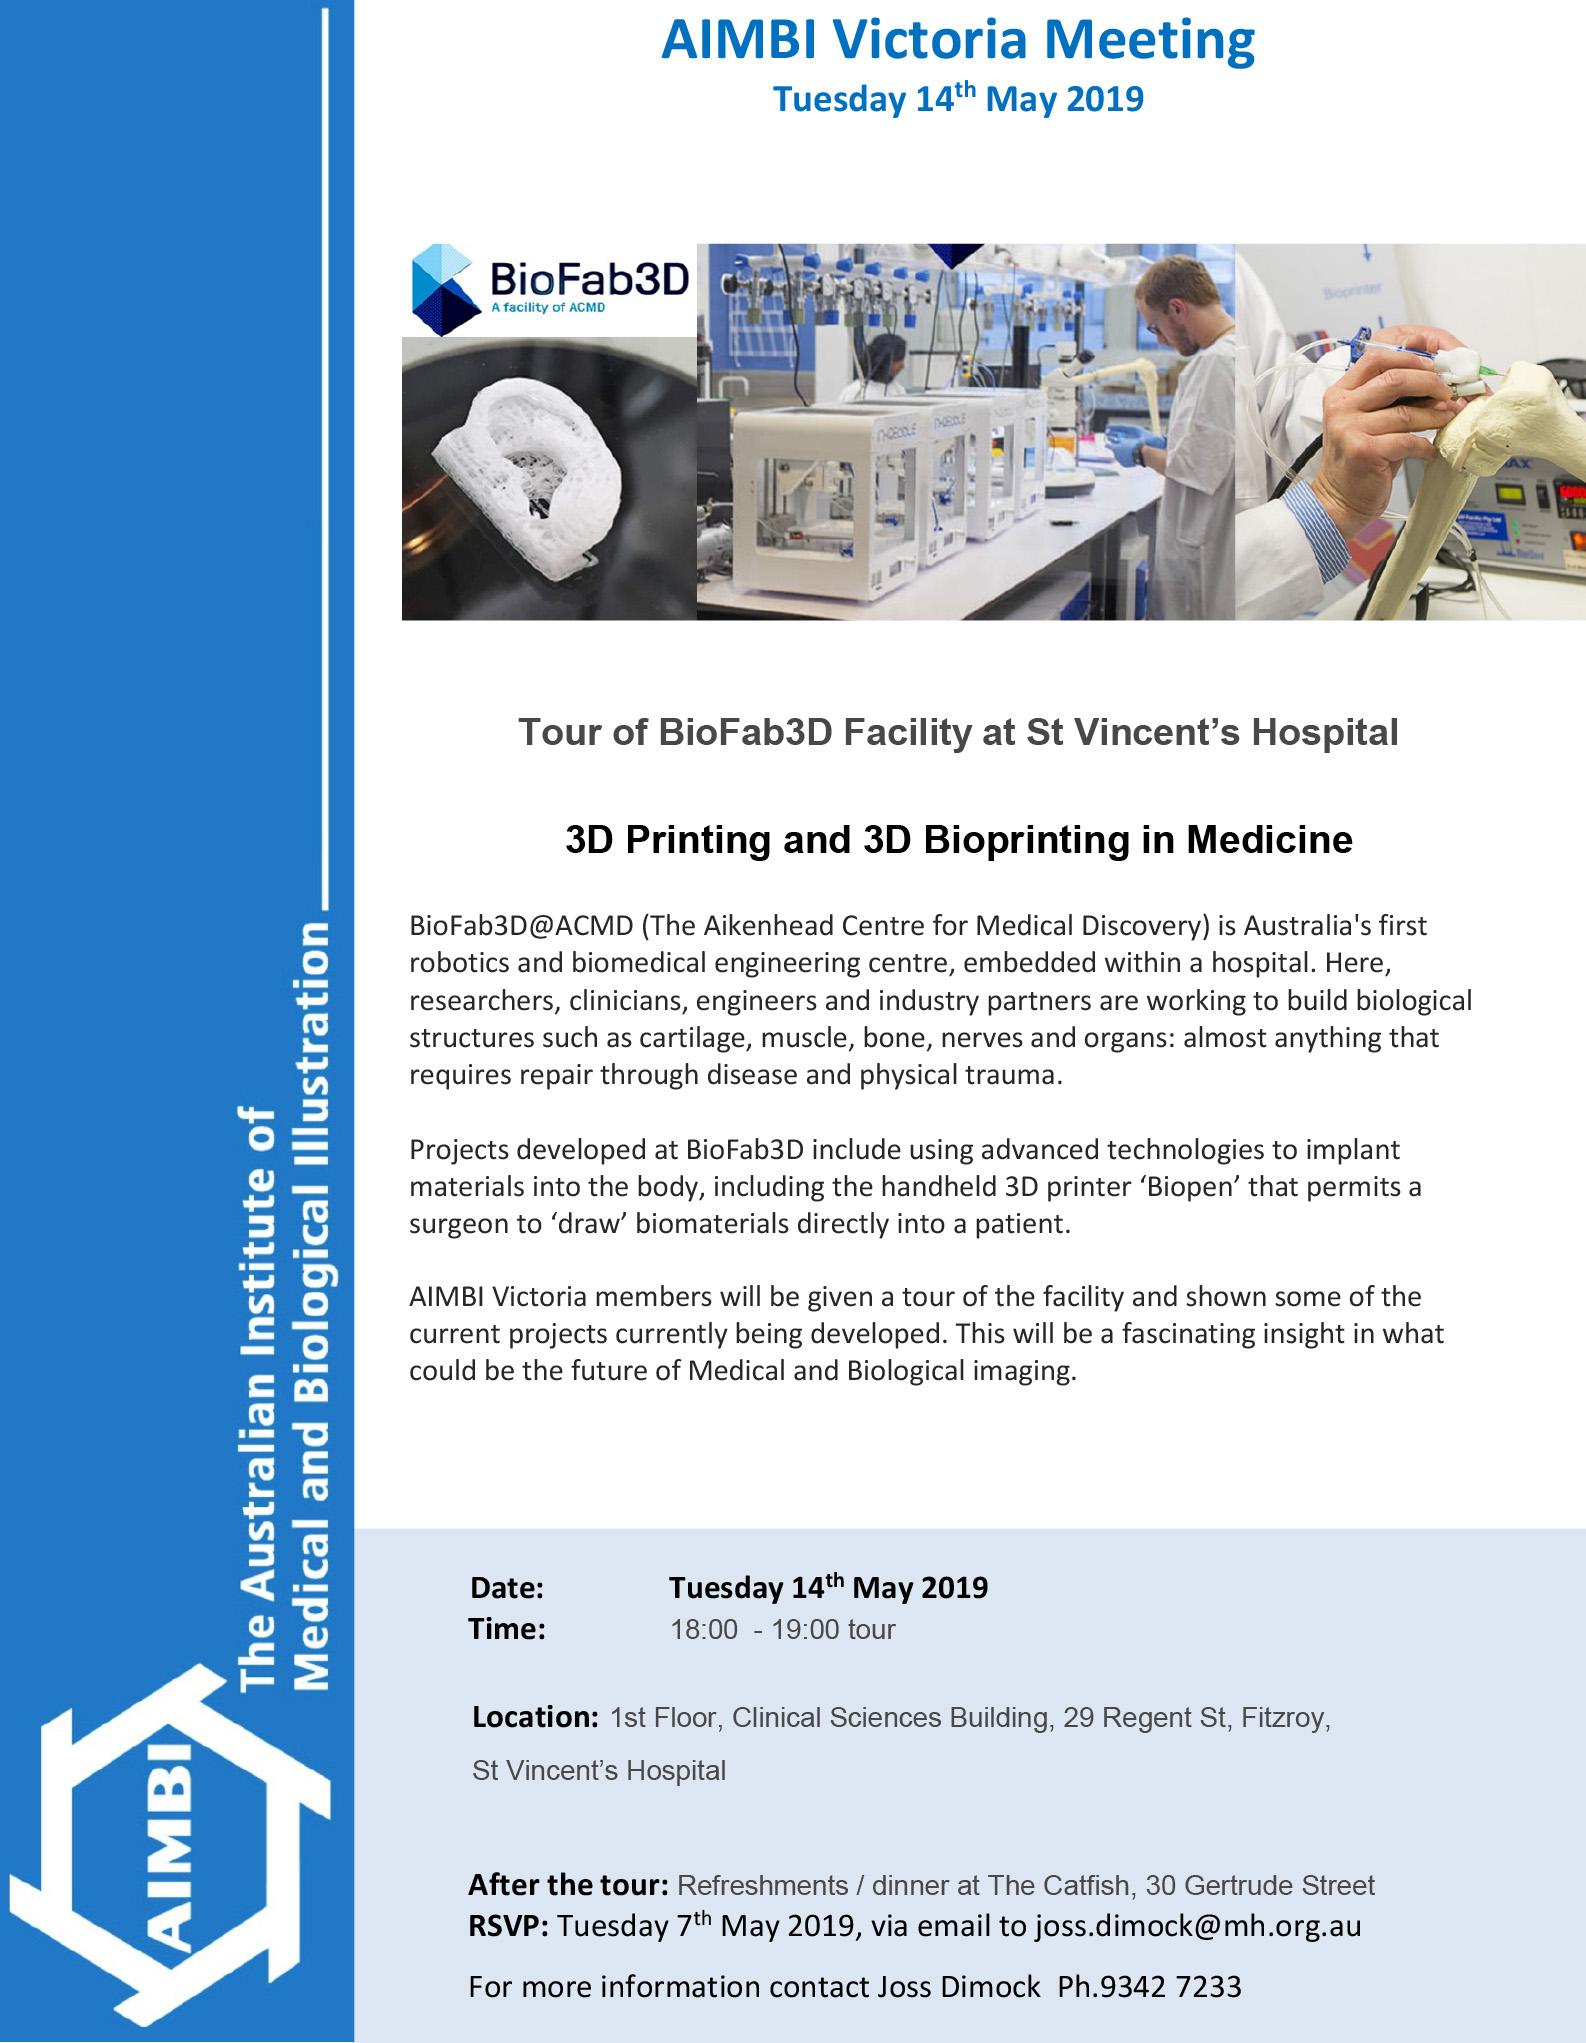 2019-AIMBI-VIC-BioFab3D-May_Meeting-invite-1